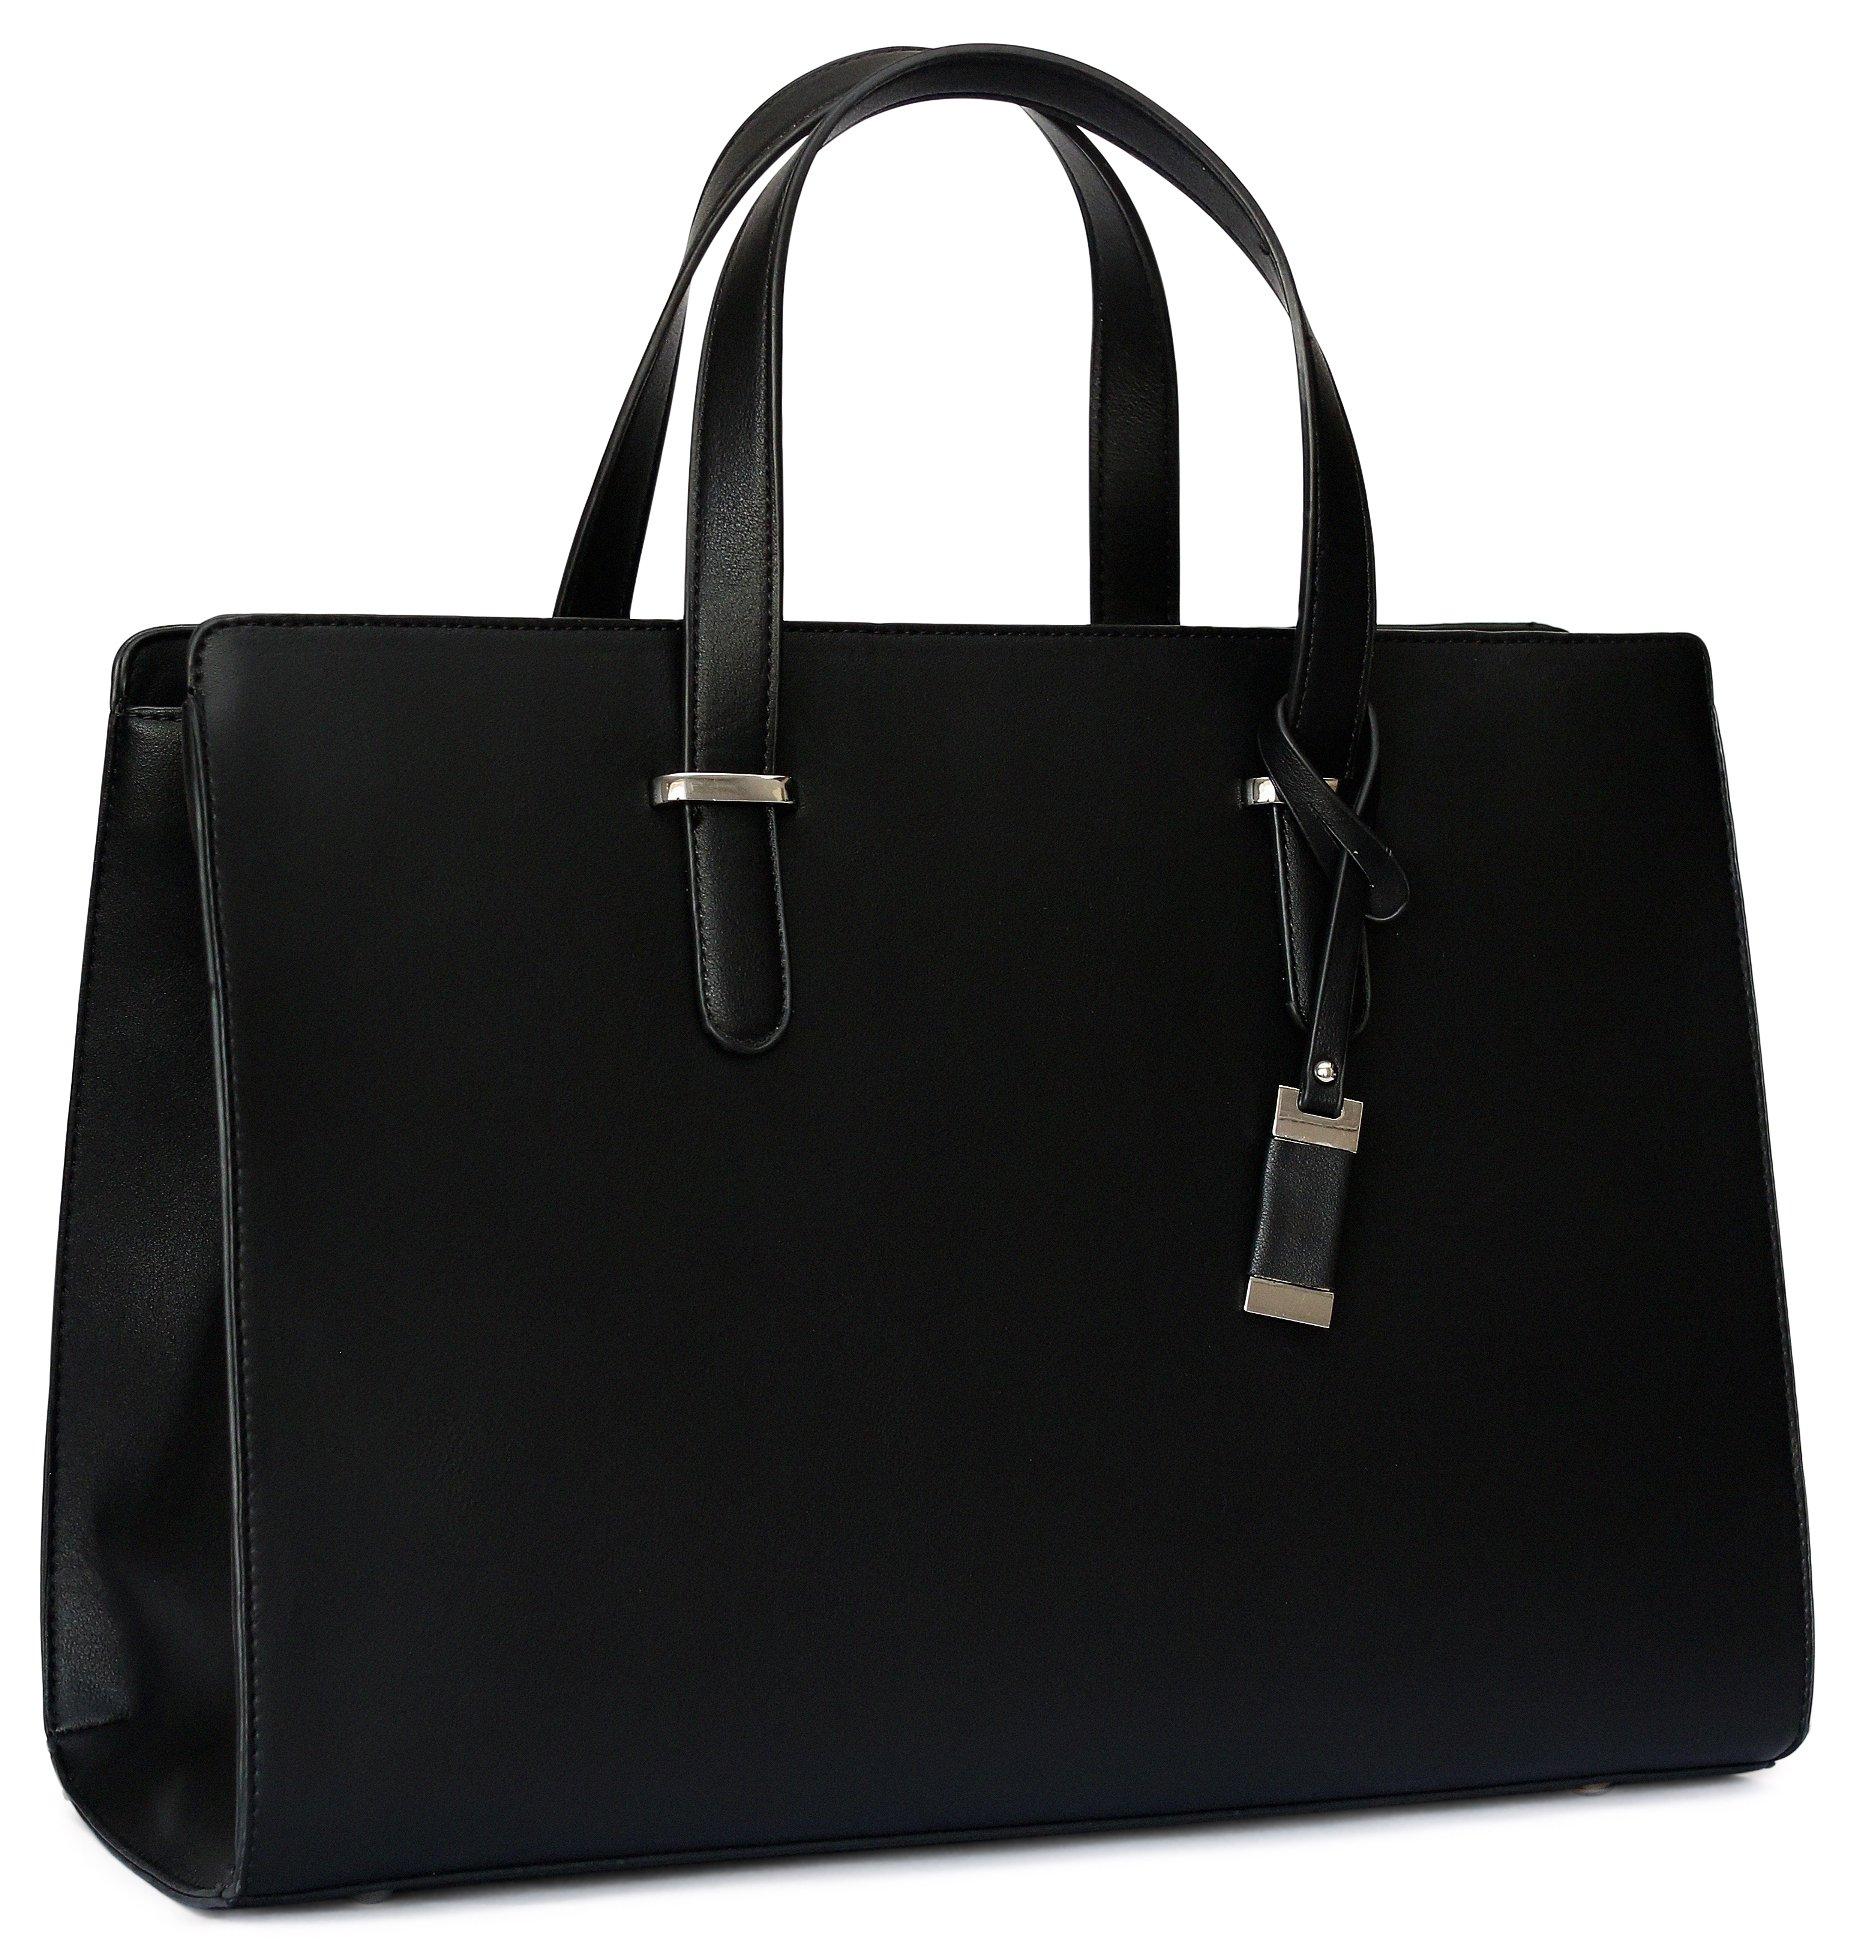 Premium Laptop Bag/Handbag For Women - Durable Computer Carrier Messenger Bag For College Students, Office Workers & Businesswomen | High End &Fashionable Tote Bag For Laptops/Notebooks (Black)